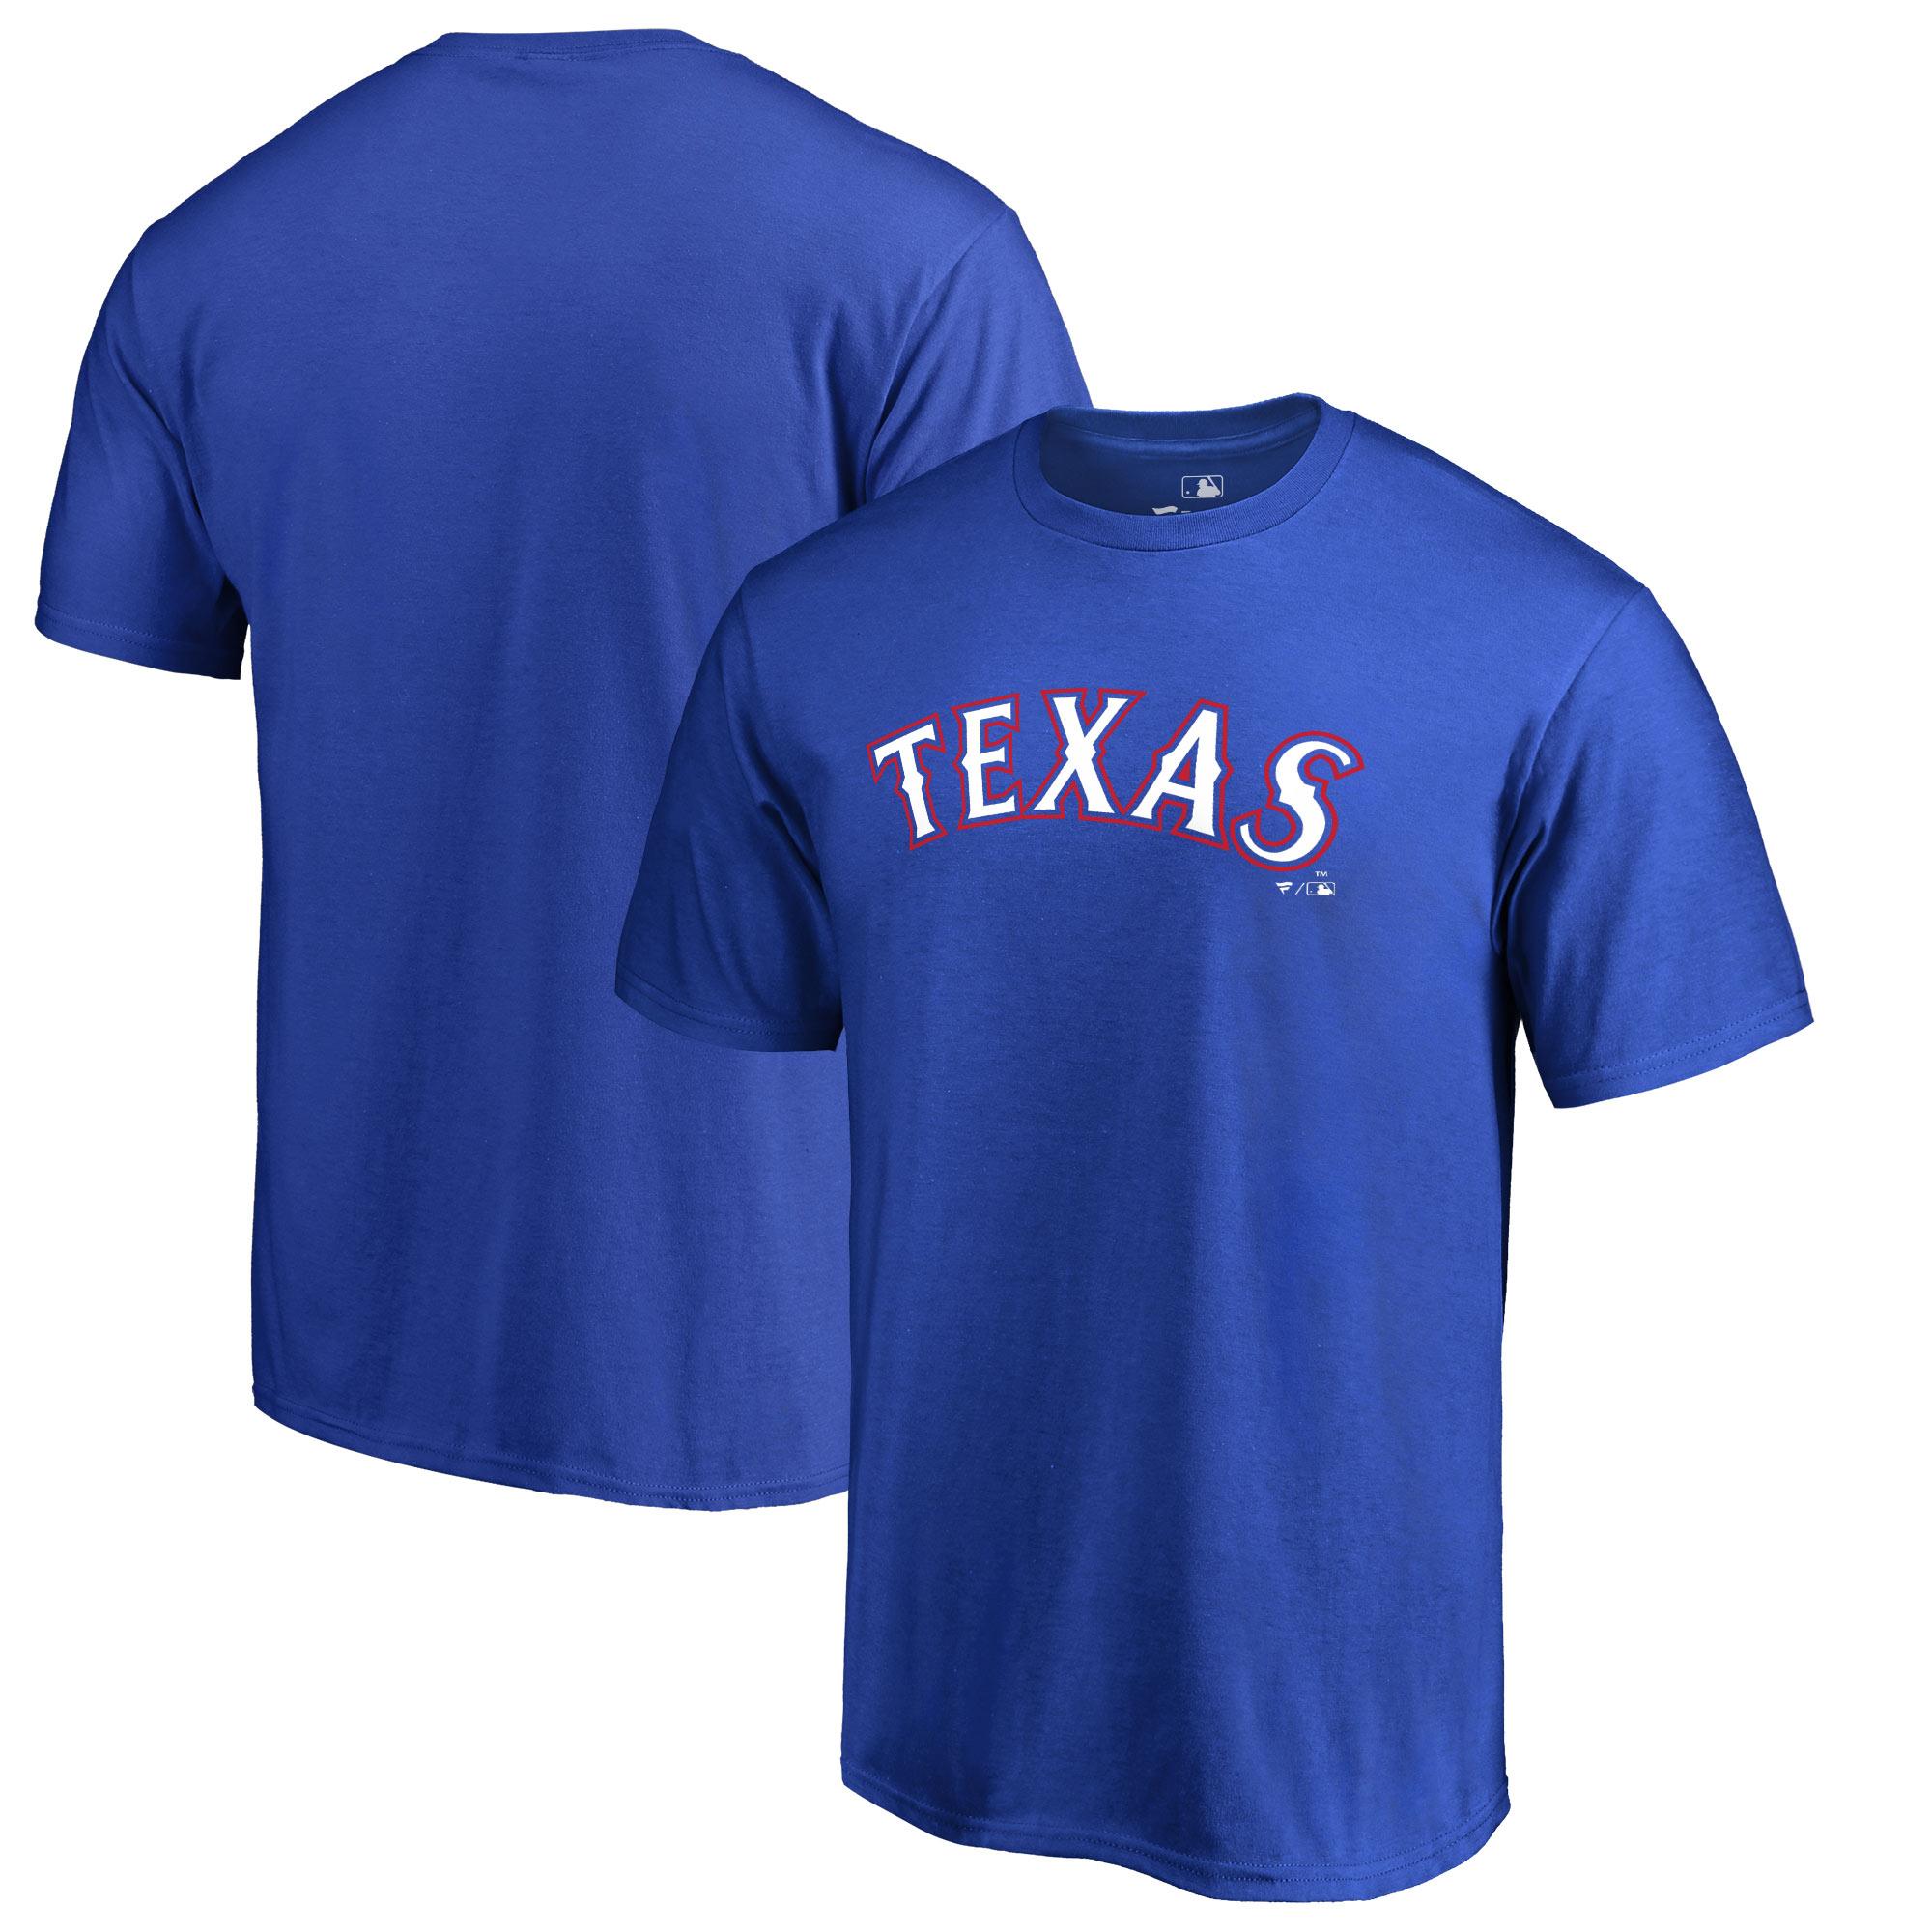 Texas Rangers Fanatics Branded Team Wordmark T-Shirt - Royal